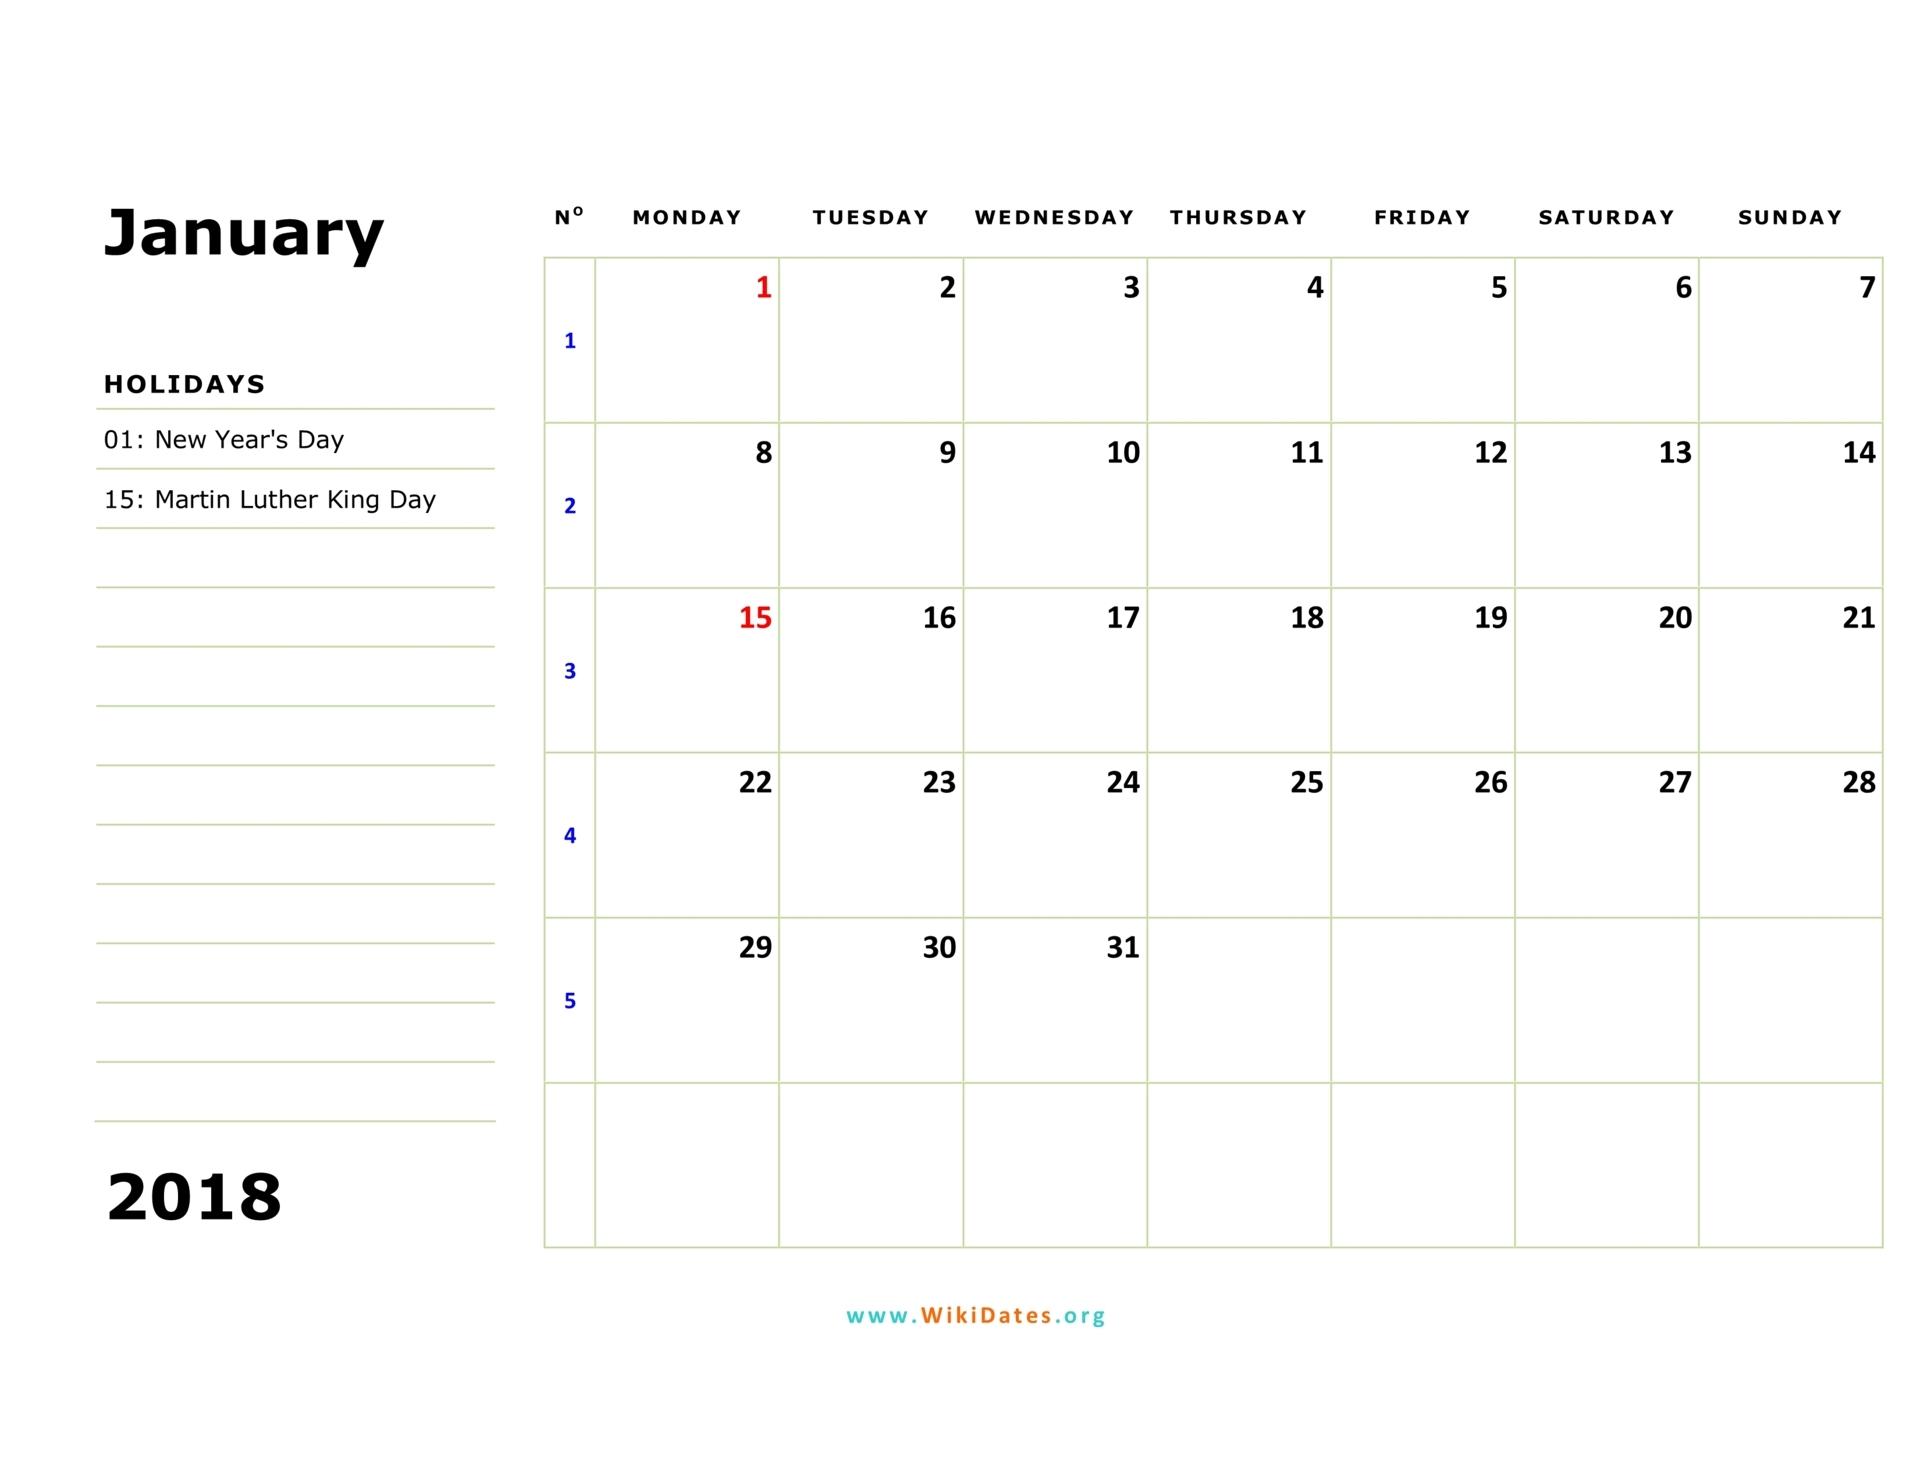 Monthly Planner Calendar Labs : Calendar wikidates